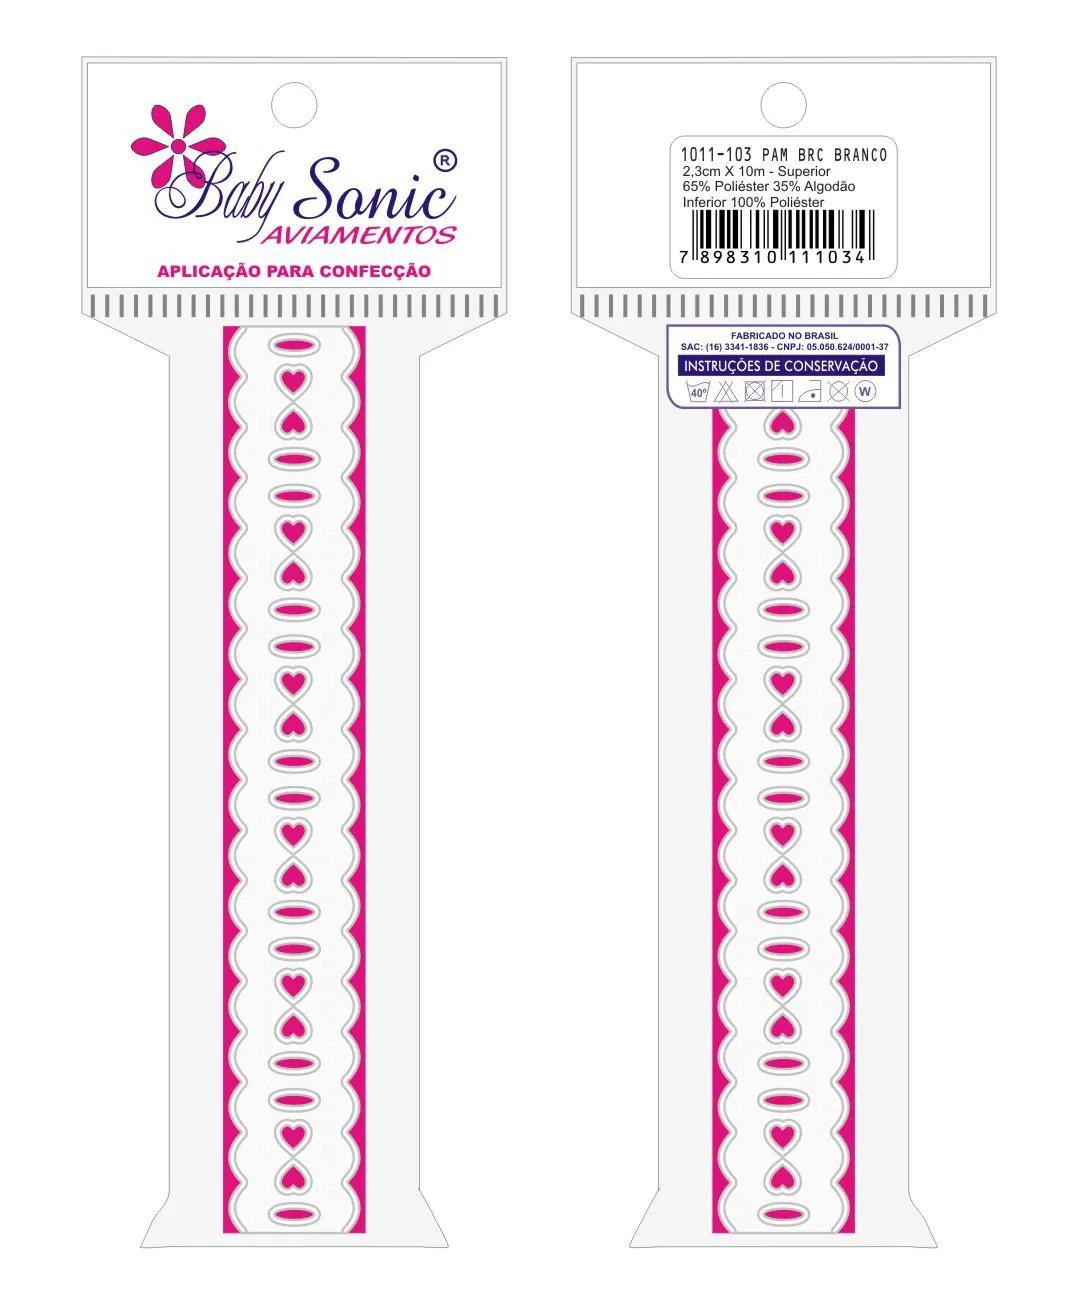 1011 Passa Fita 2,3cm X 10m KIT c/10un Branco PAM  - Baby Sonic Aviamentos